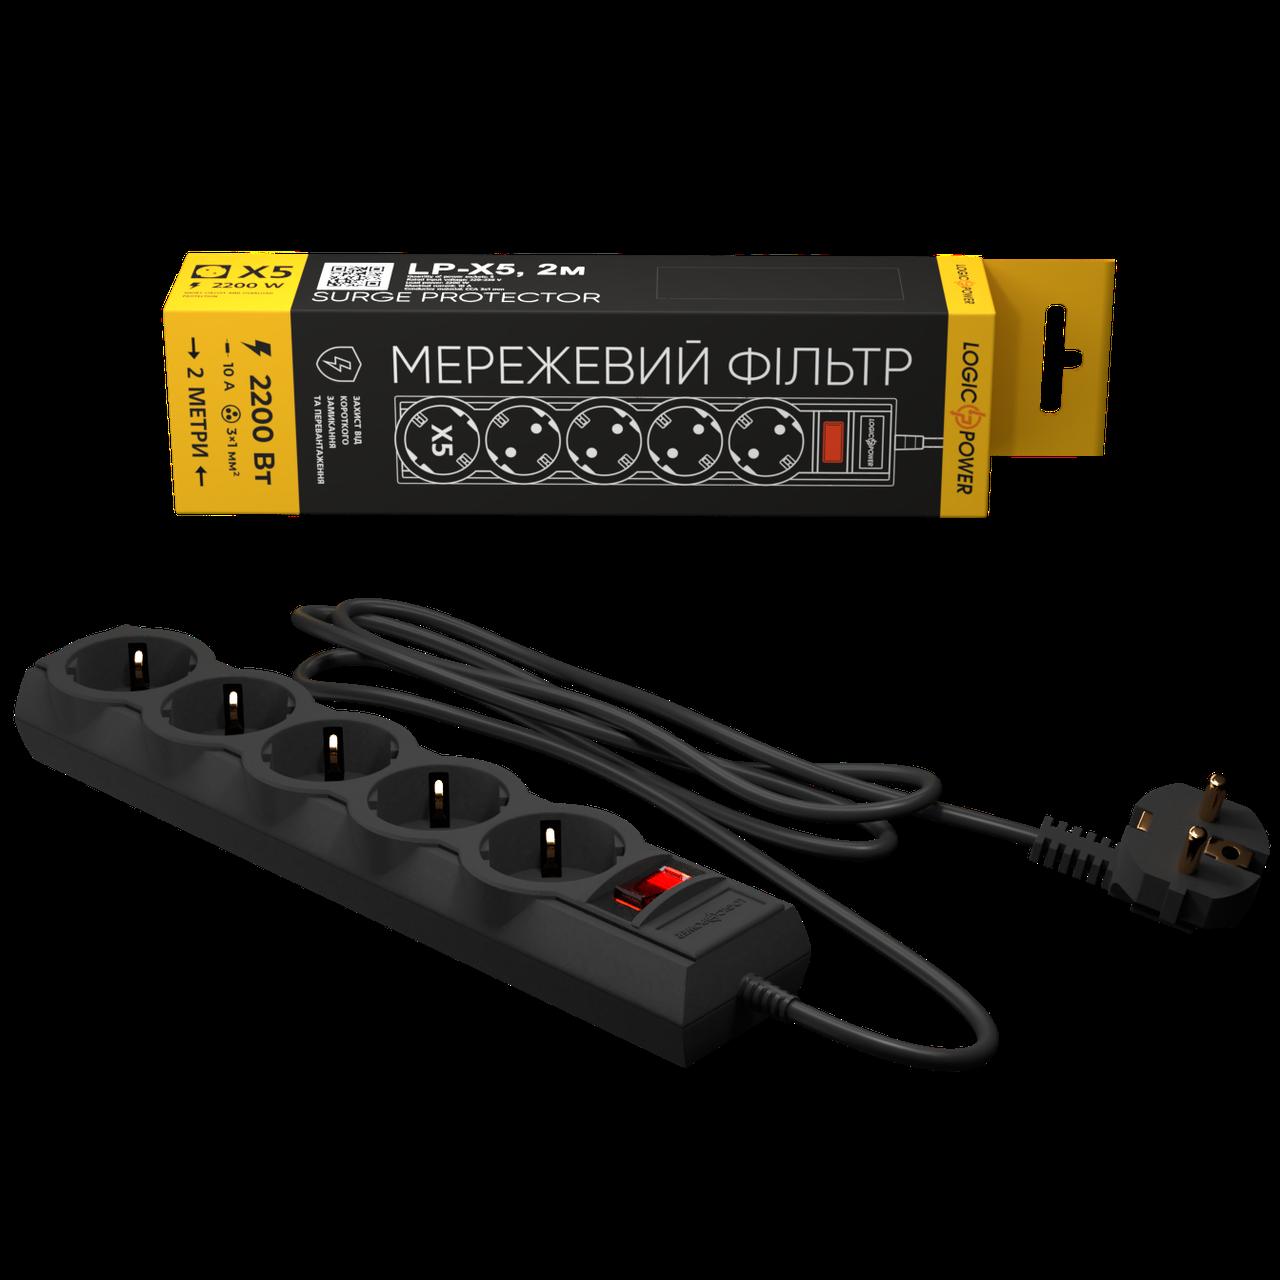 Сетевой фильтр LogicPower LP-X5 Premium, 2m, 5 розеток, 16А. black (3520Вт)